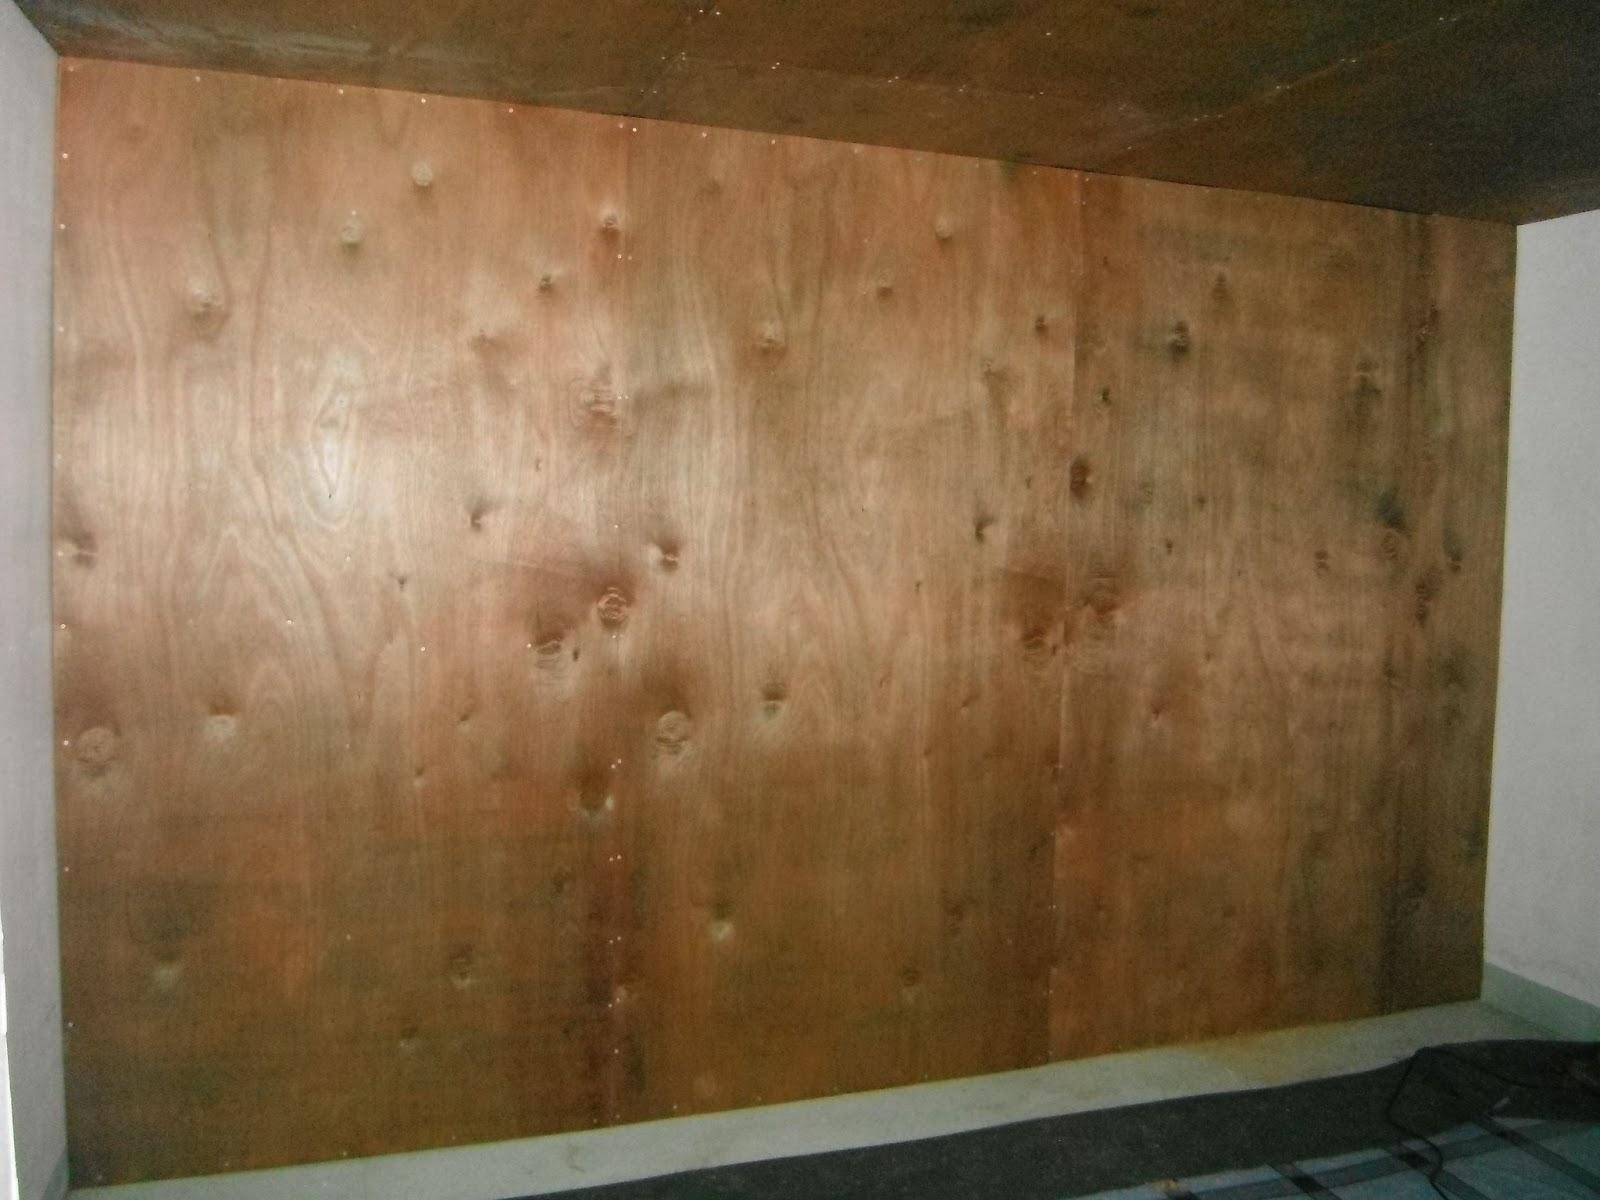 Iris micronesia july 2013 for Plywood wall sheathing